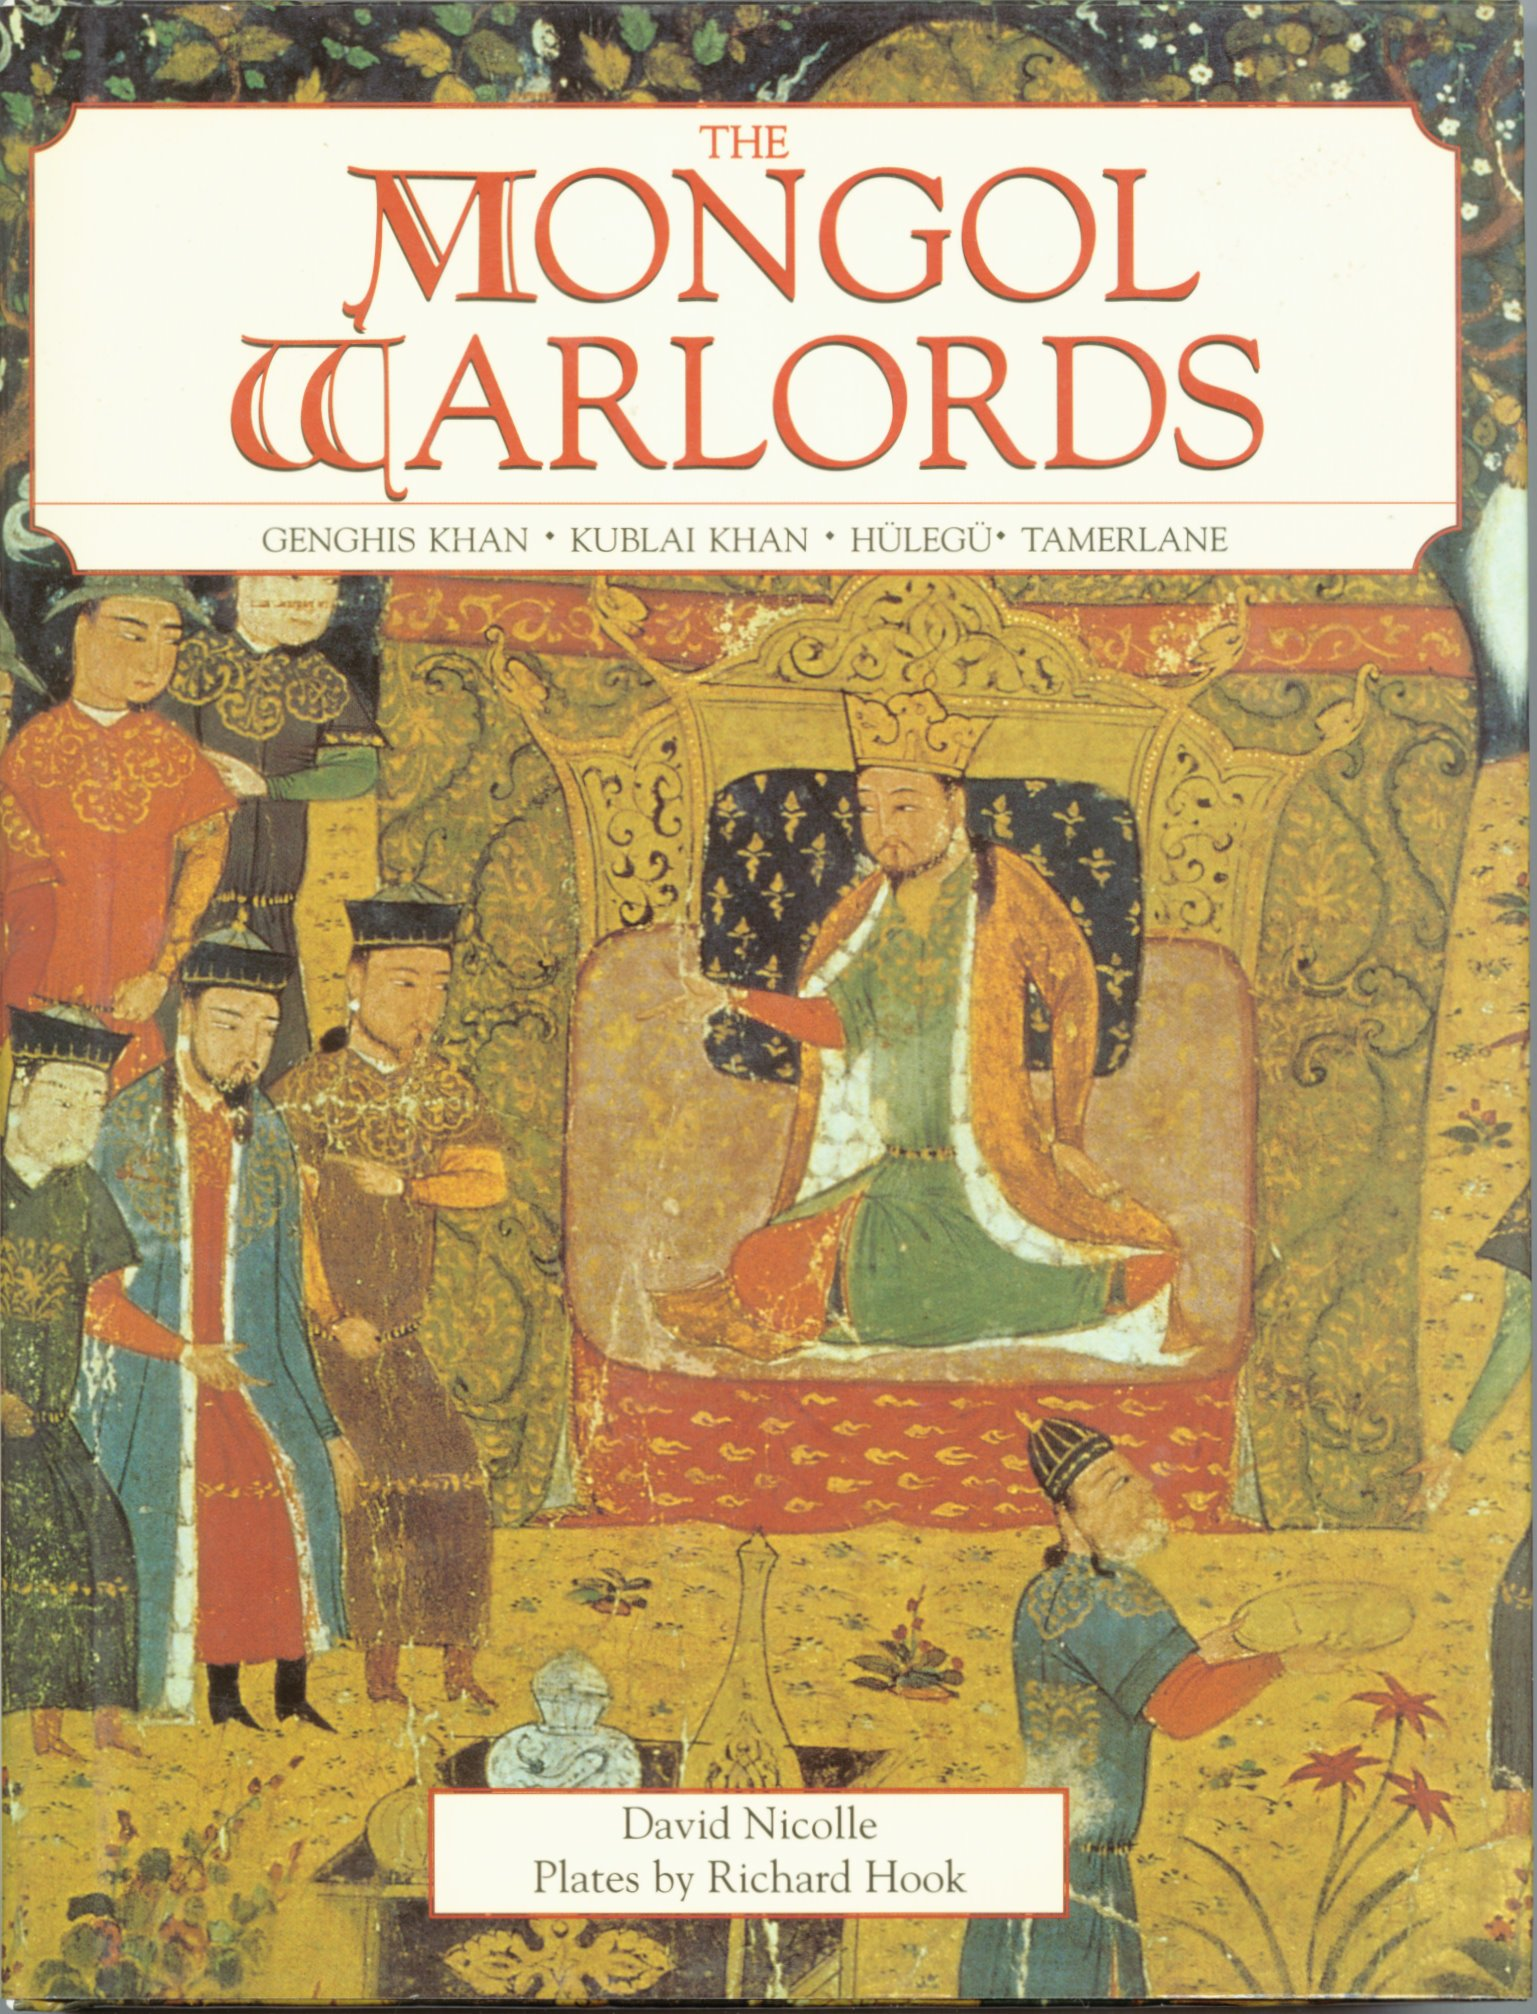 kublai khan achievements